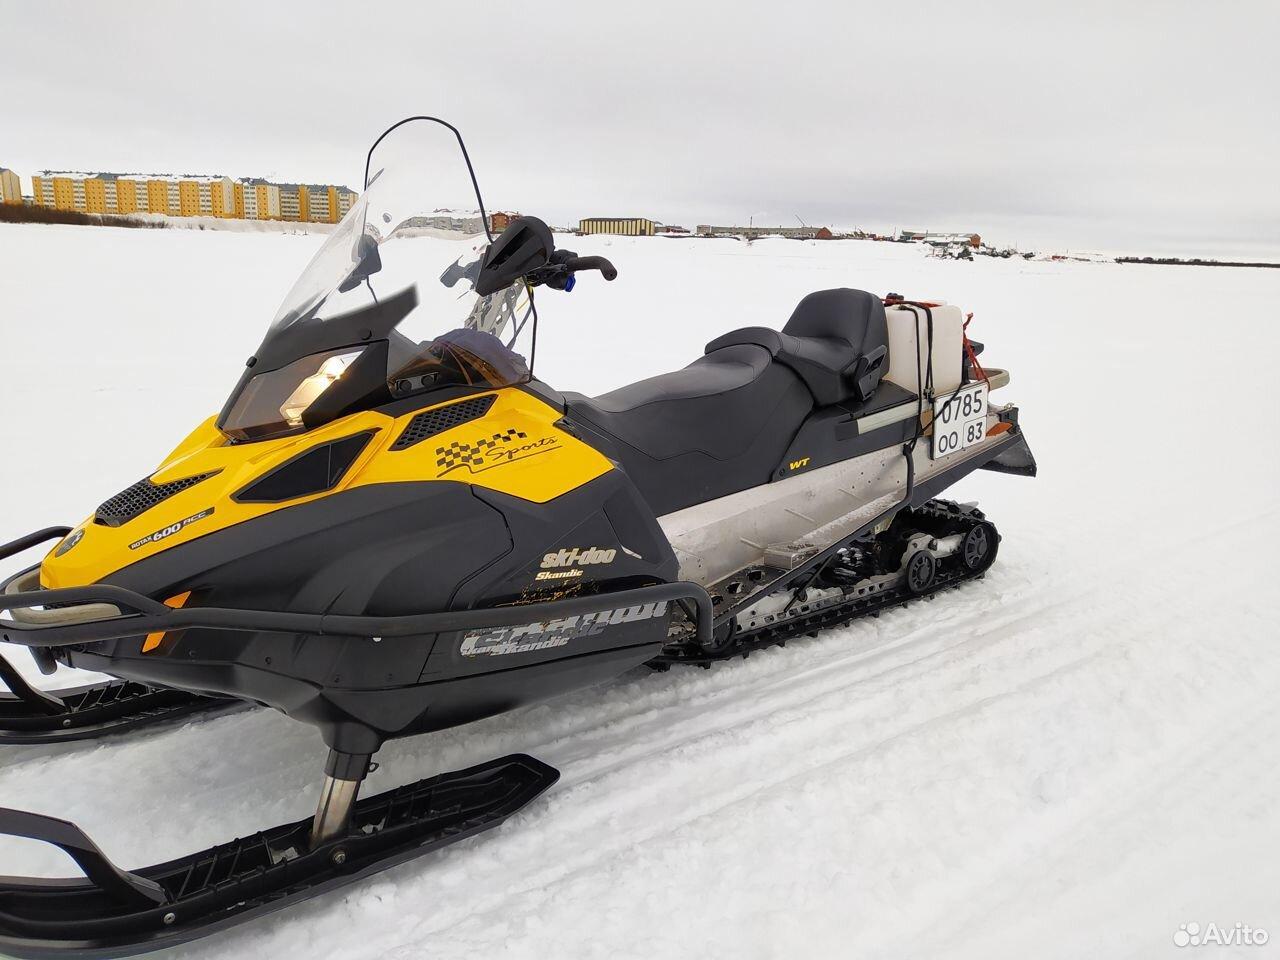 Ski- doo 600ase